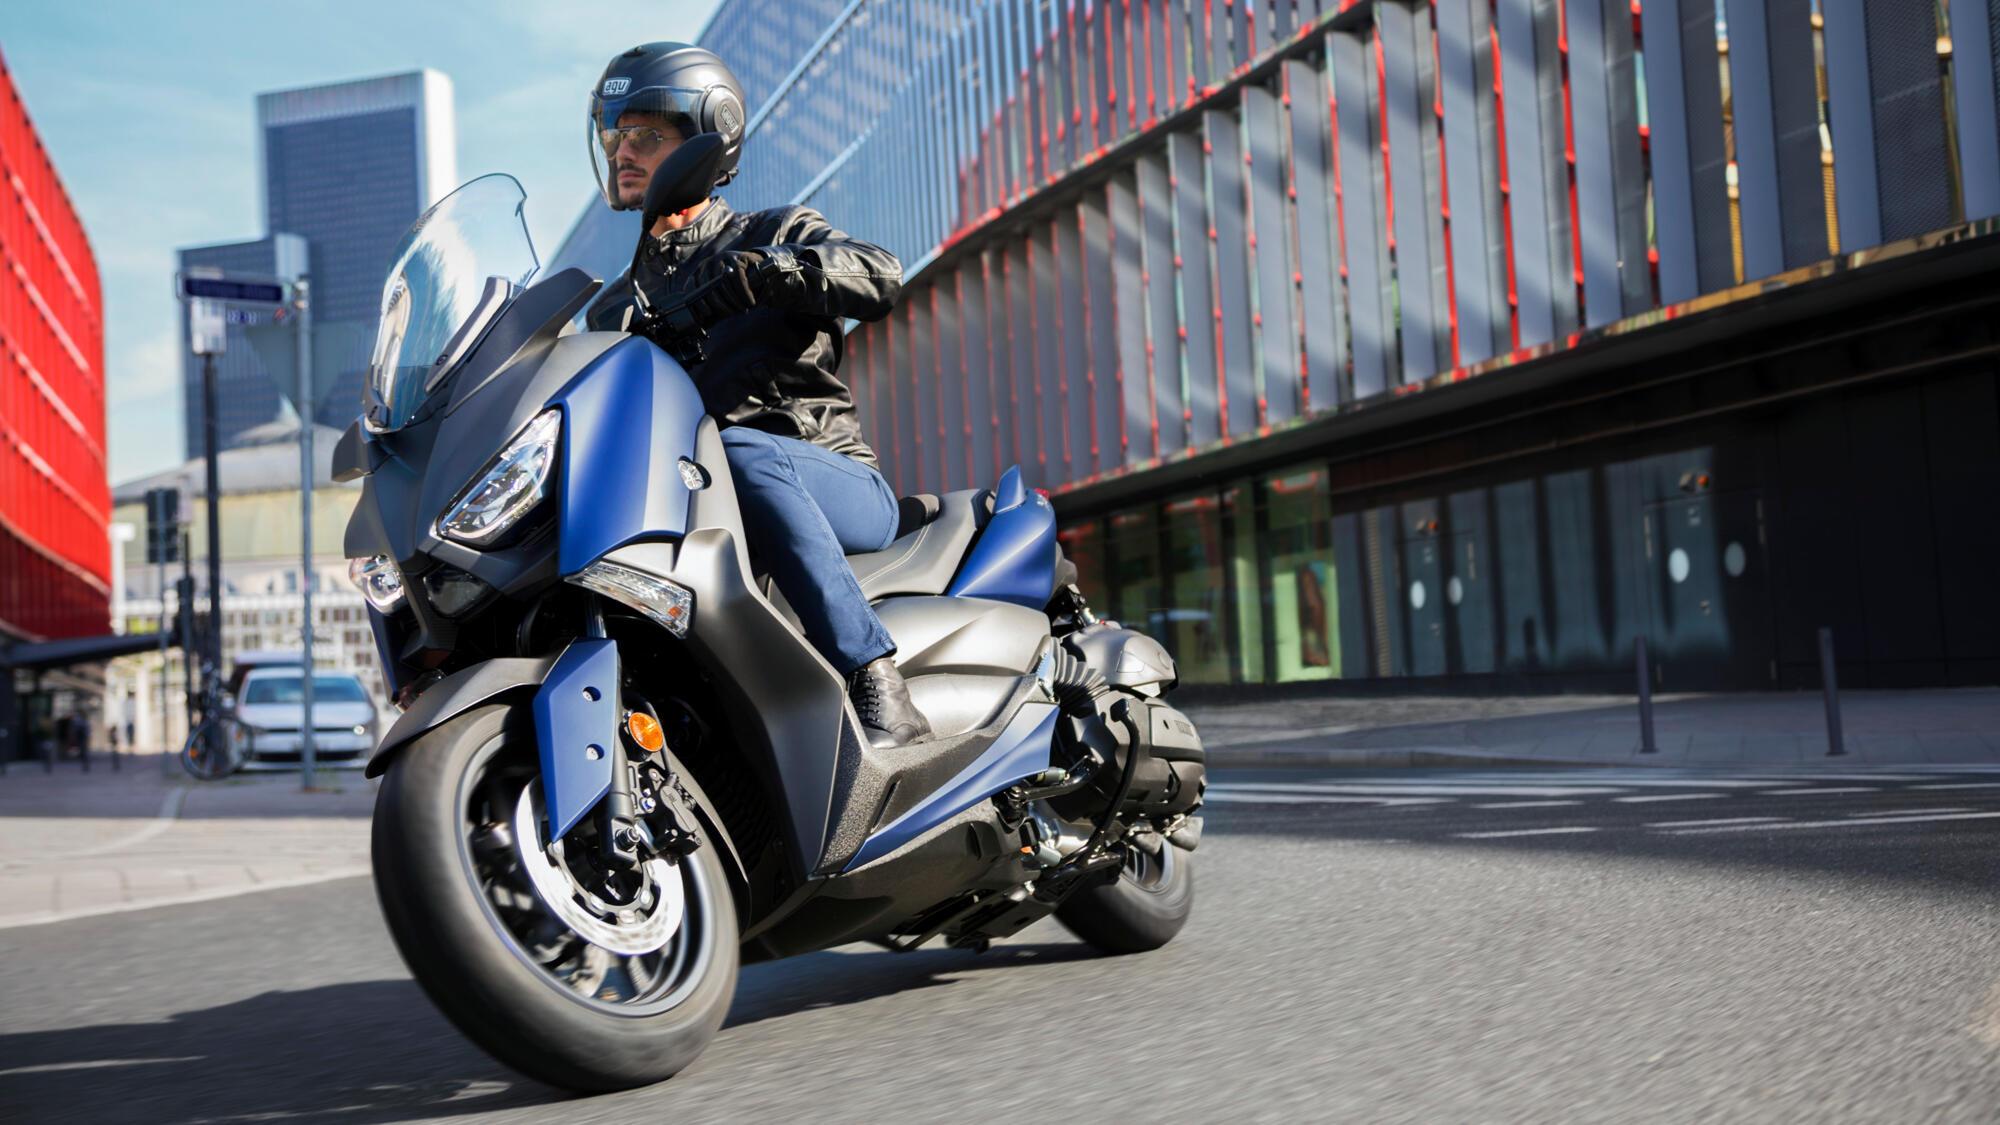 XMAX 400 - scooters - Yamaha Motor